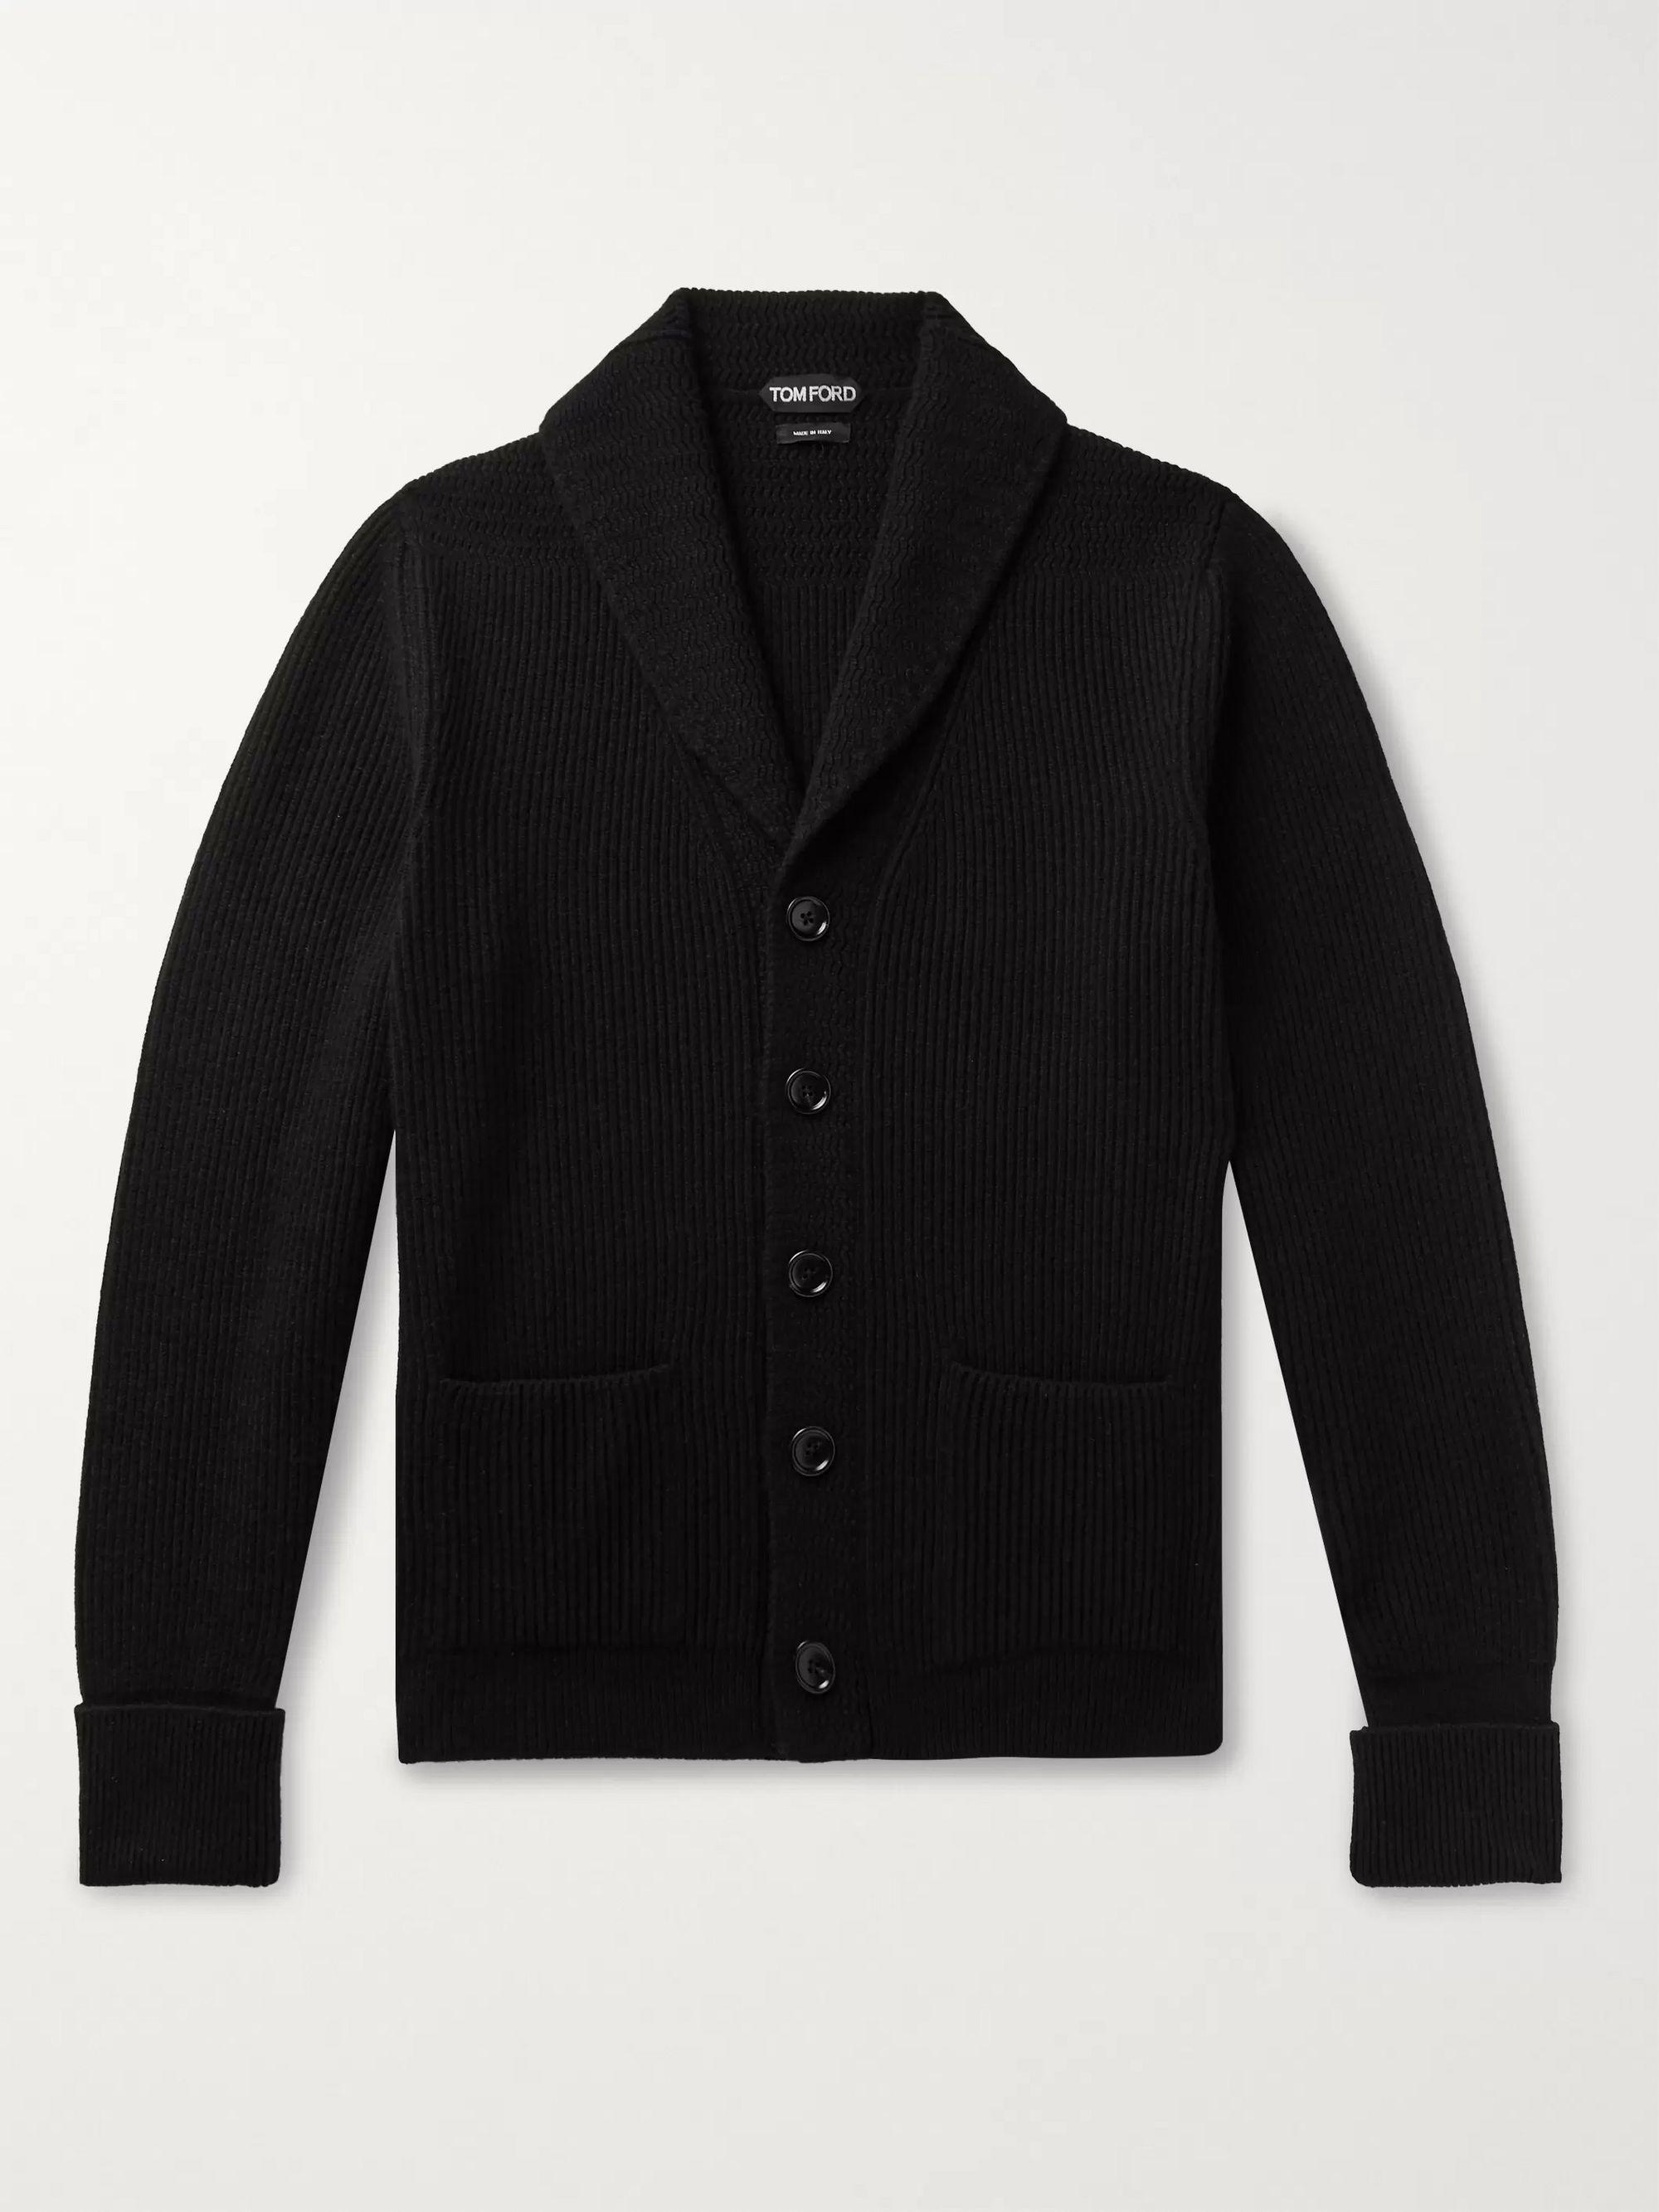 Black Slim Fit Shawl Collar Cashmere Cardigan Tom Ford Mr Porter